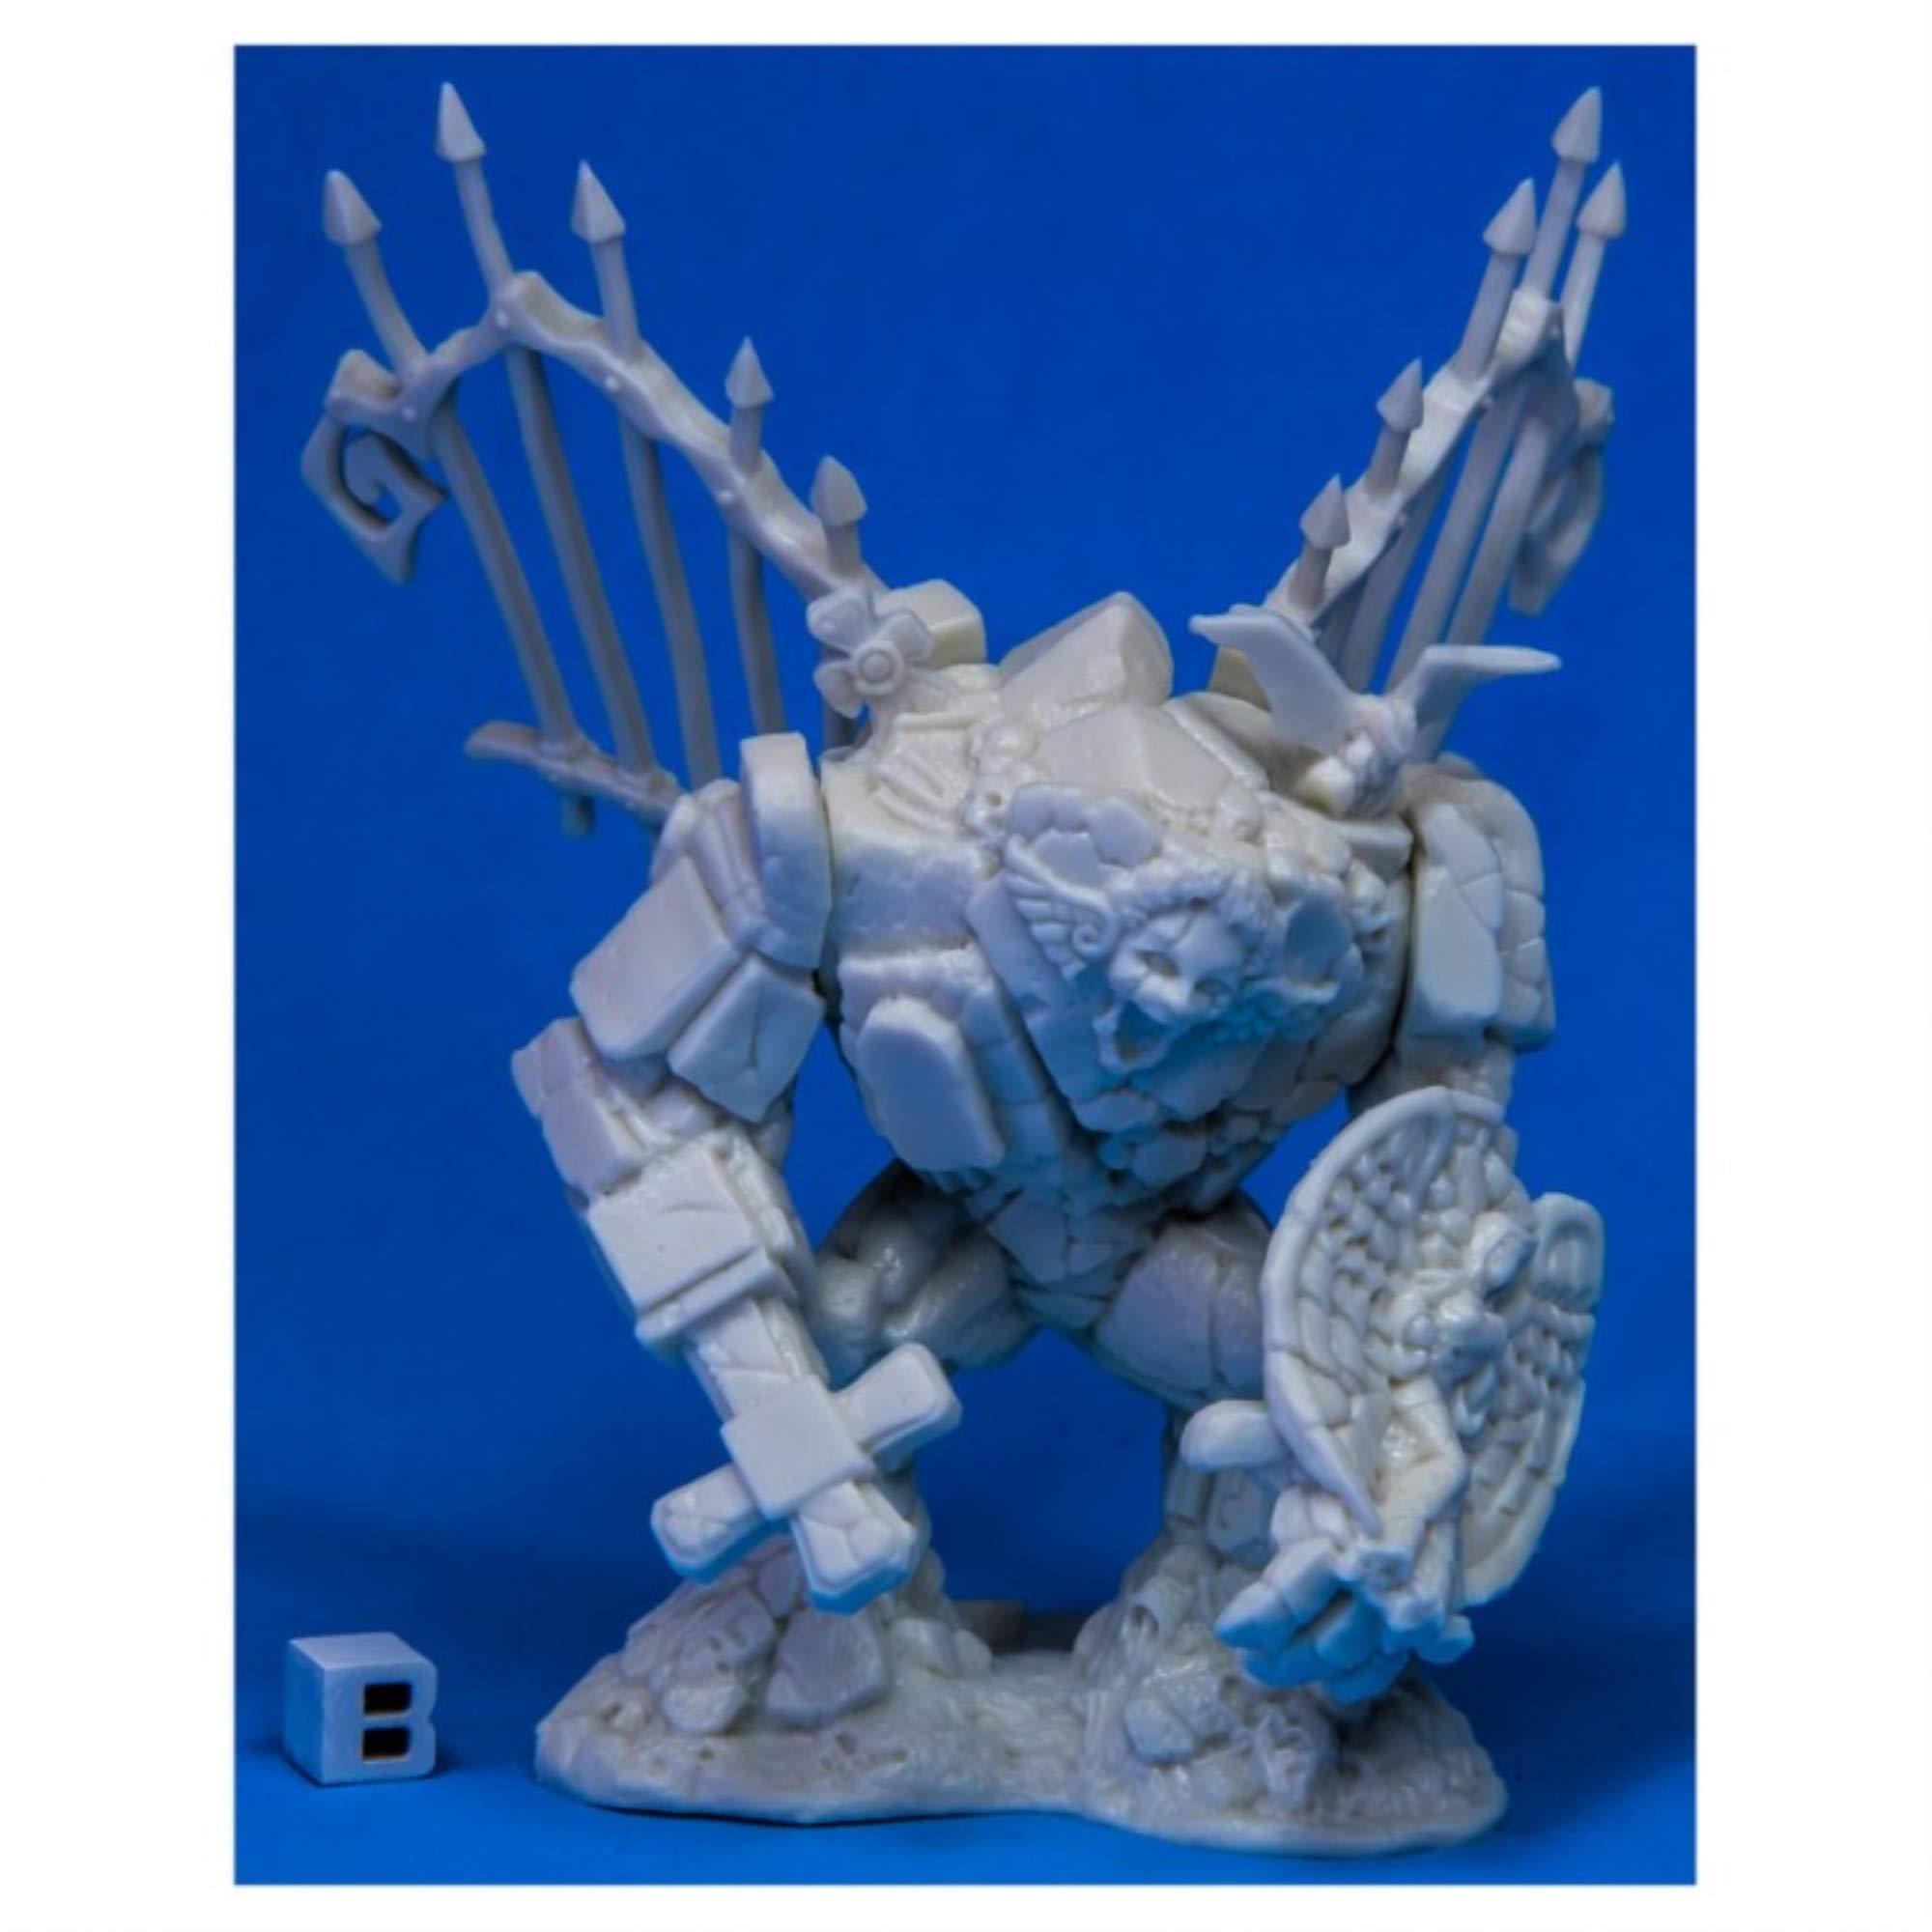 Reaper Miniatures Father Dagon 77590 Bones Unpainted RPG D/&D Figure